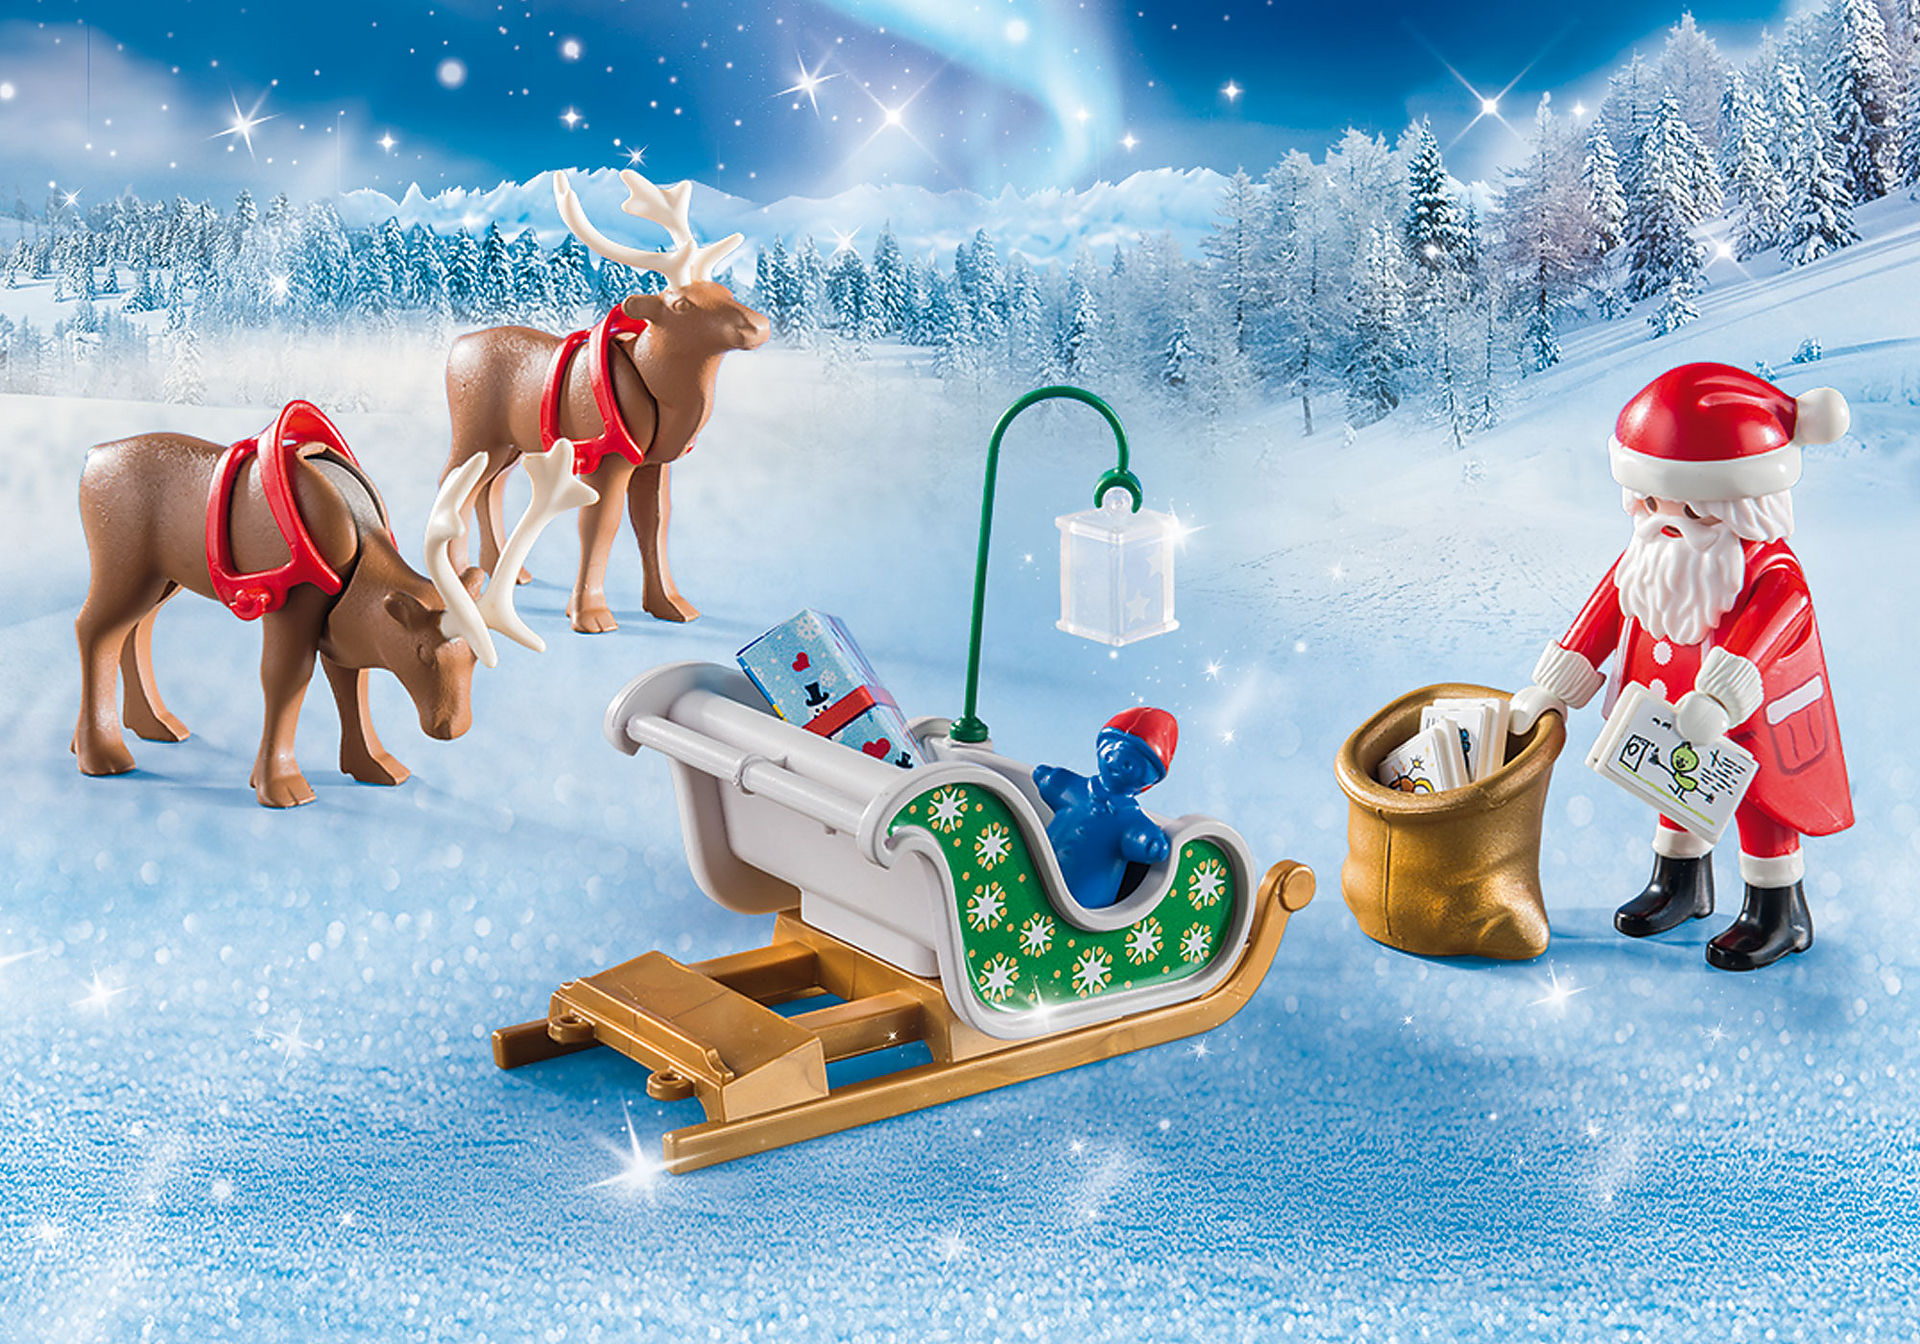 http://media.playmobil.com/i/playmobil/9496_product_extra1/Julemandens slæde med rensdyr